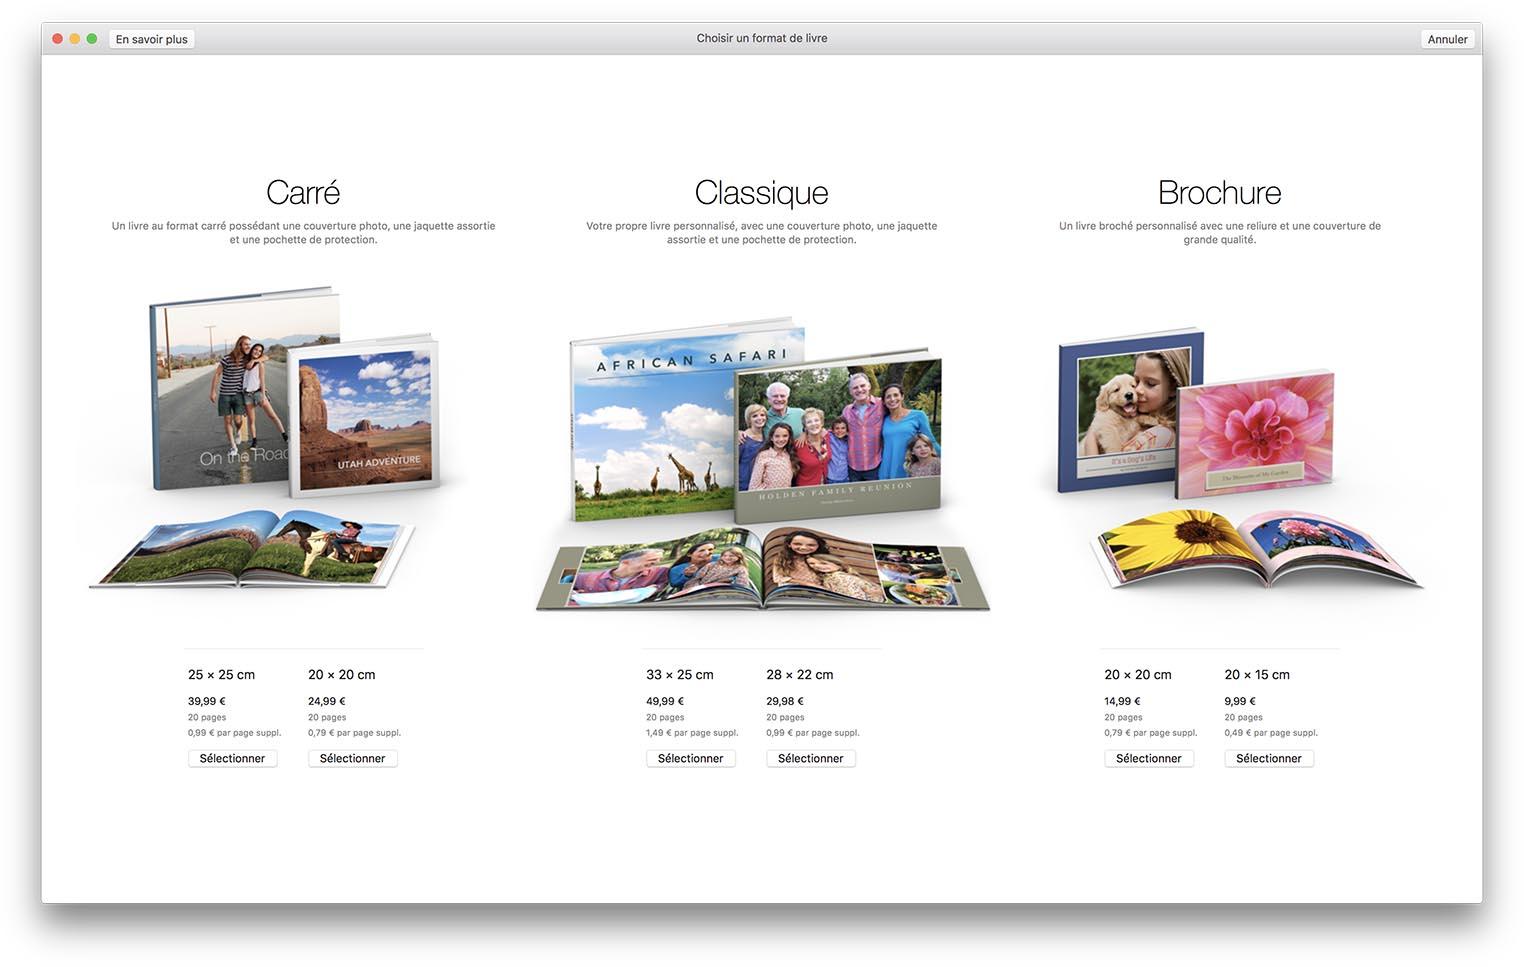 Apple impression photos